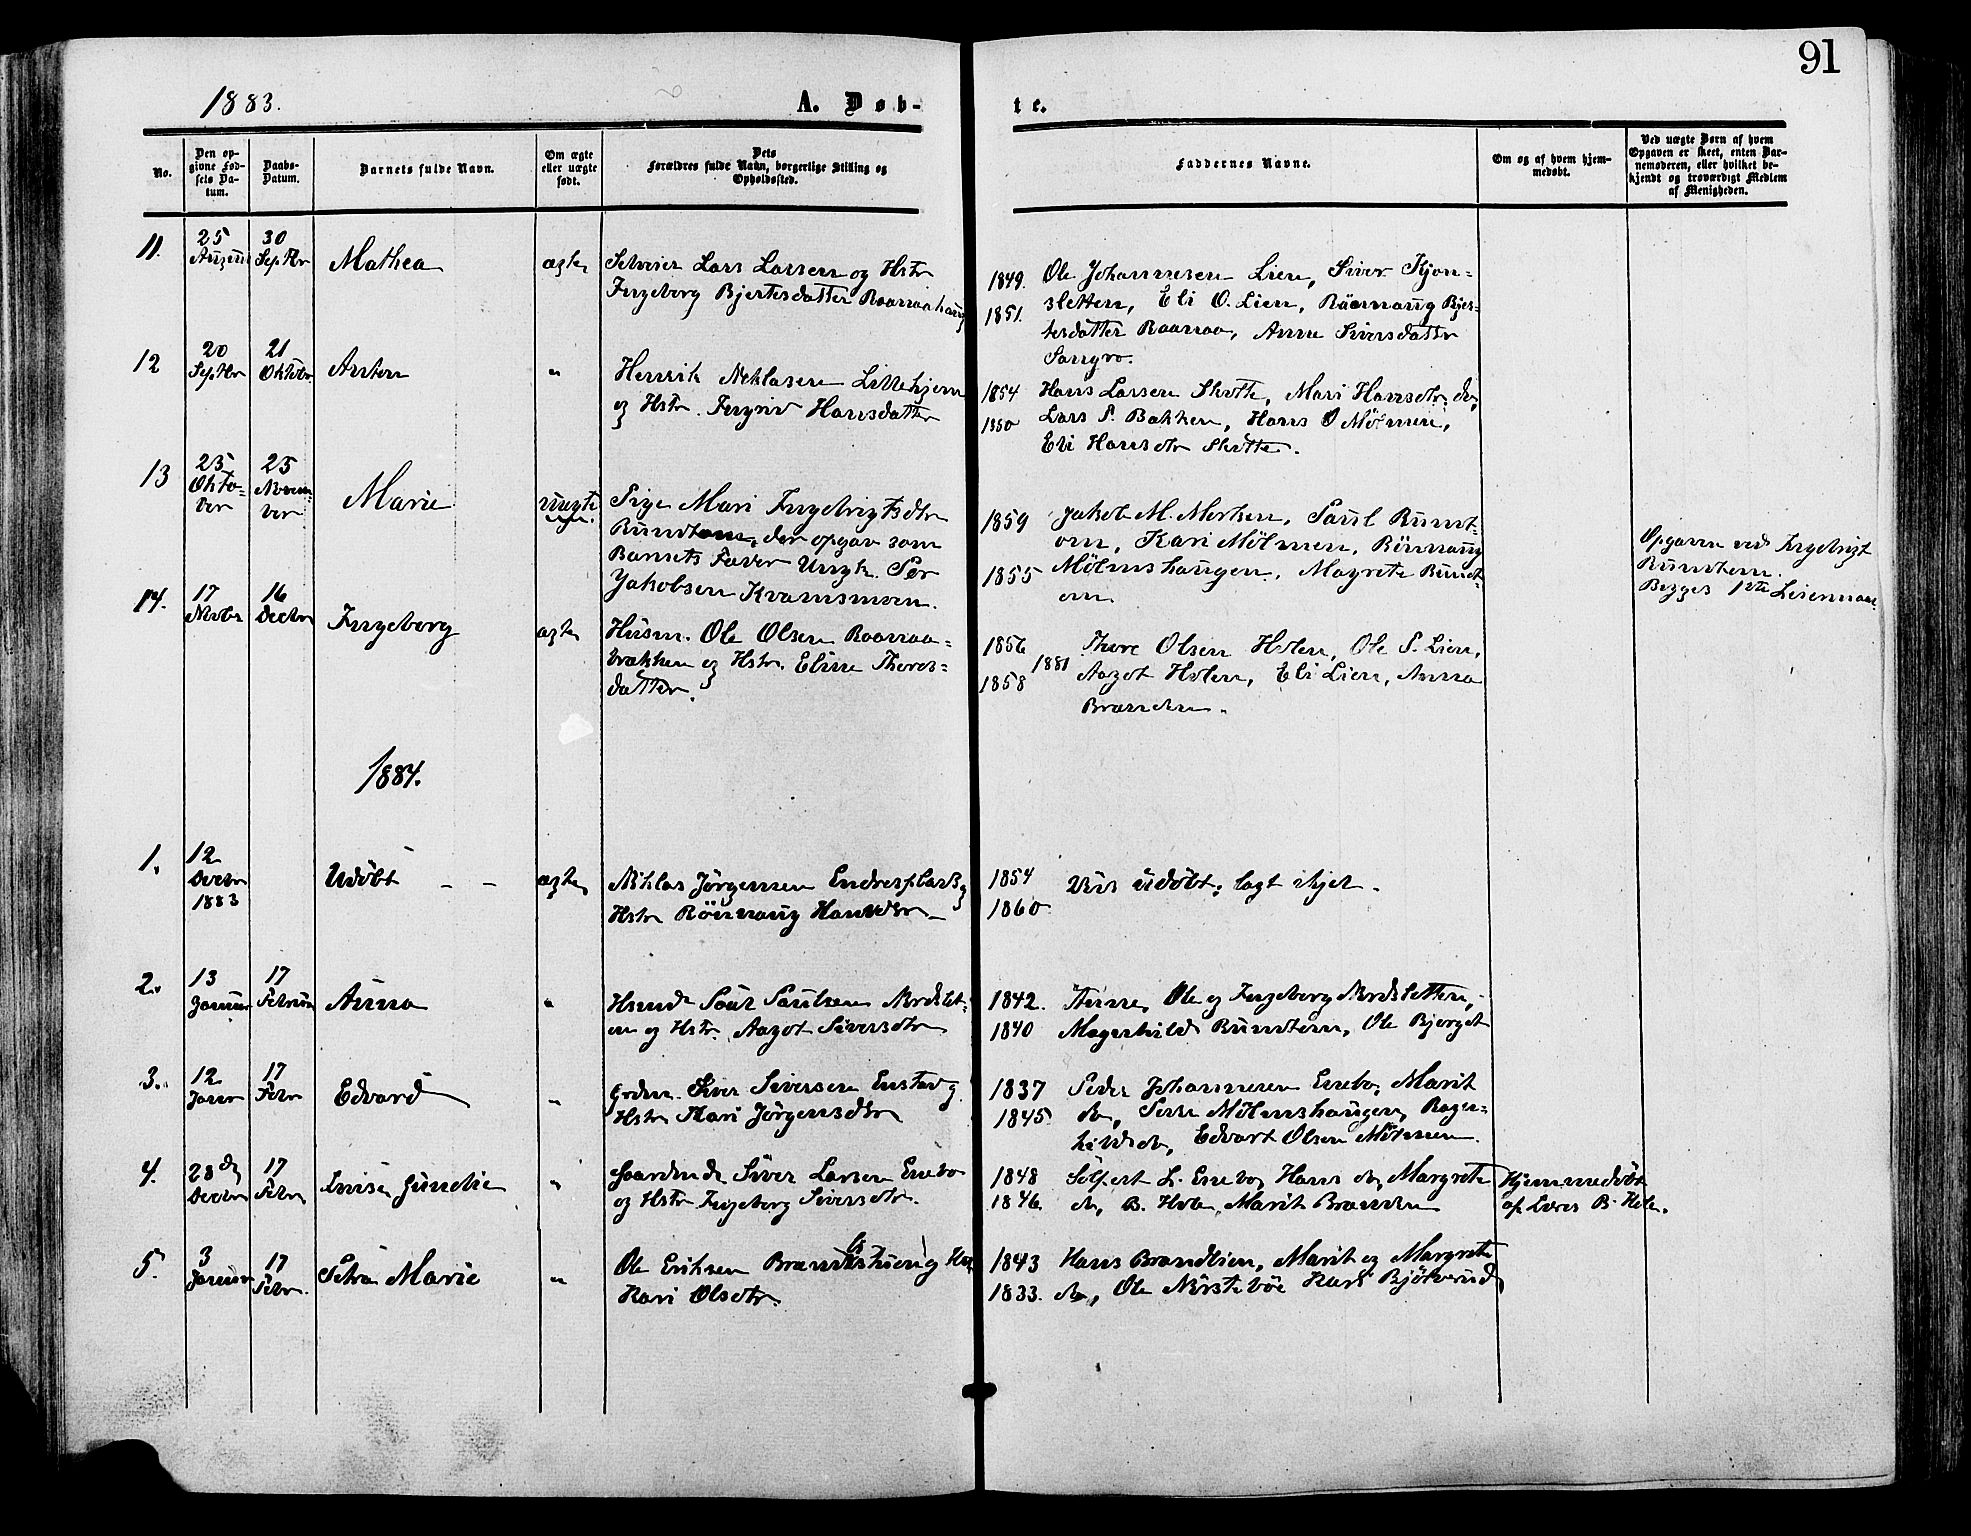 SAH, Lesja prestekontor, Ministerialbok nr. 9, 1854-1889, s. 91